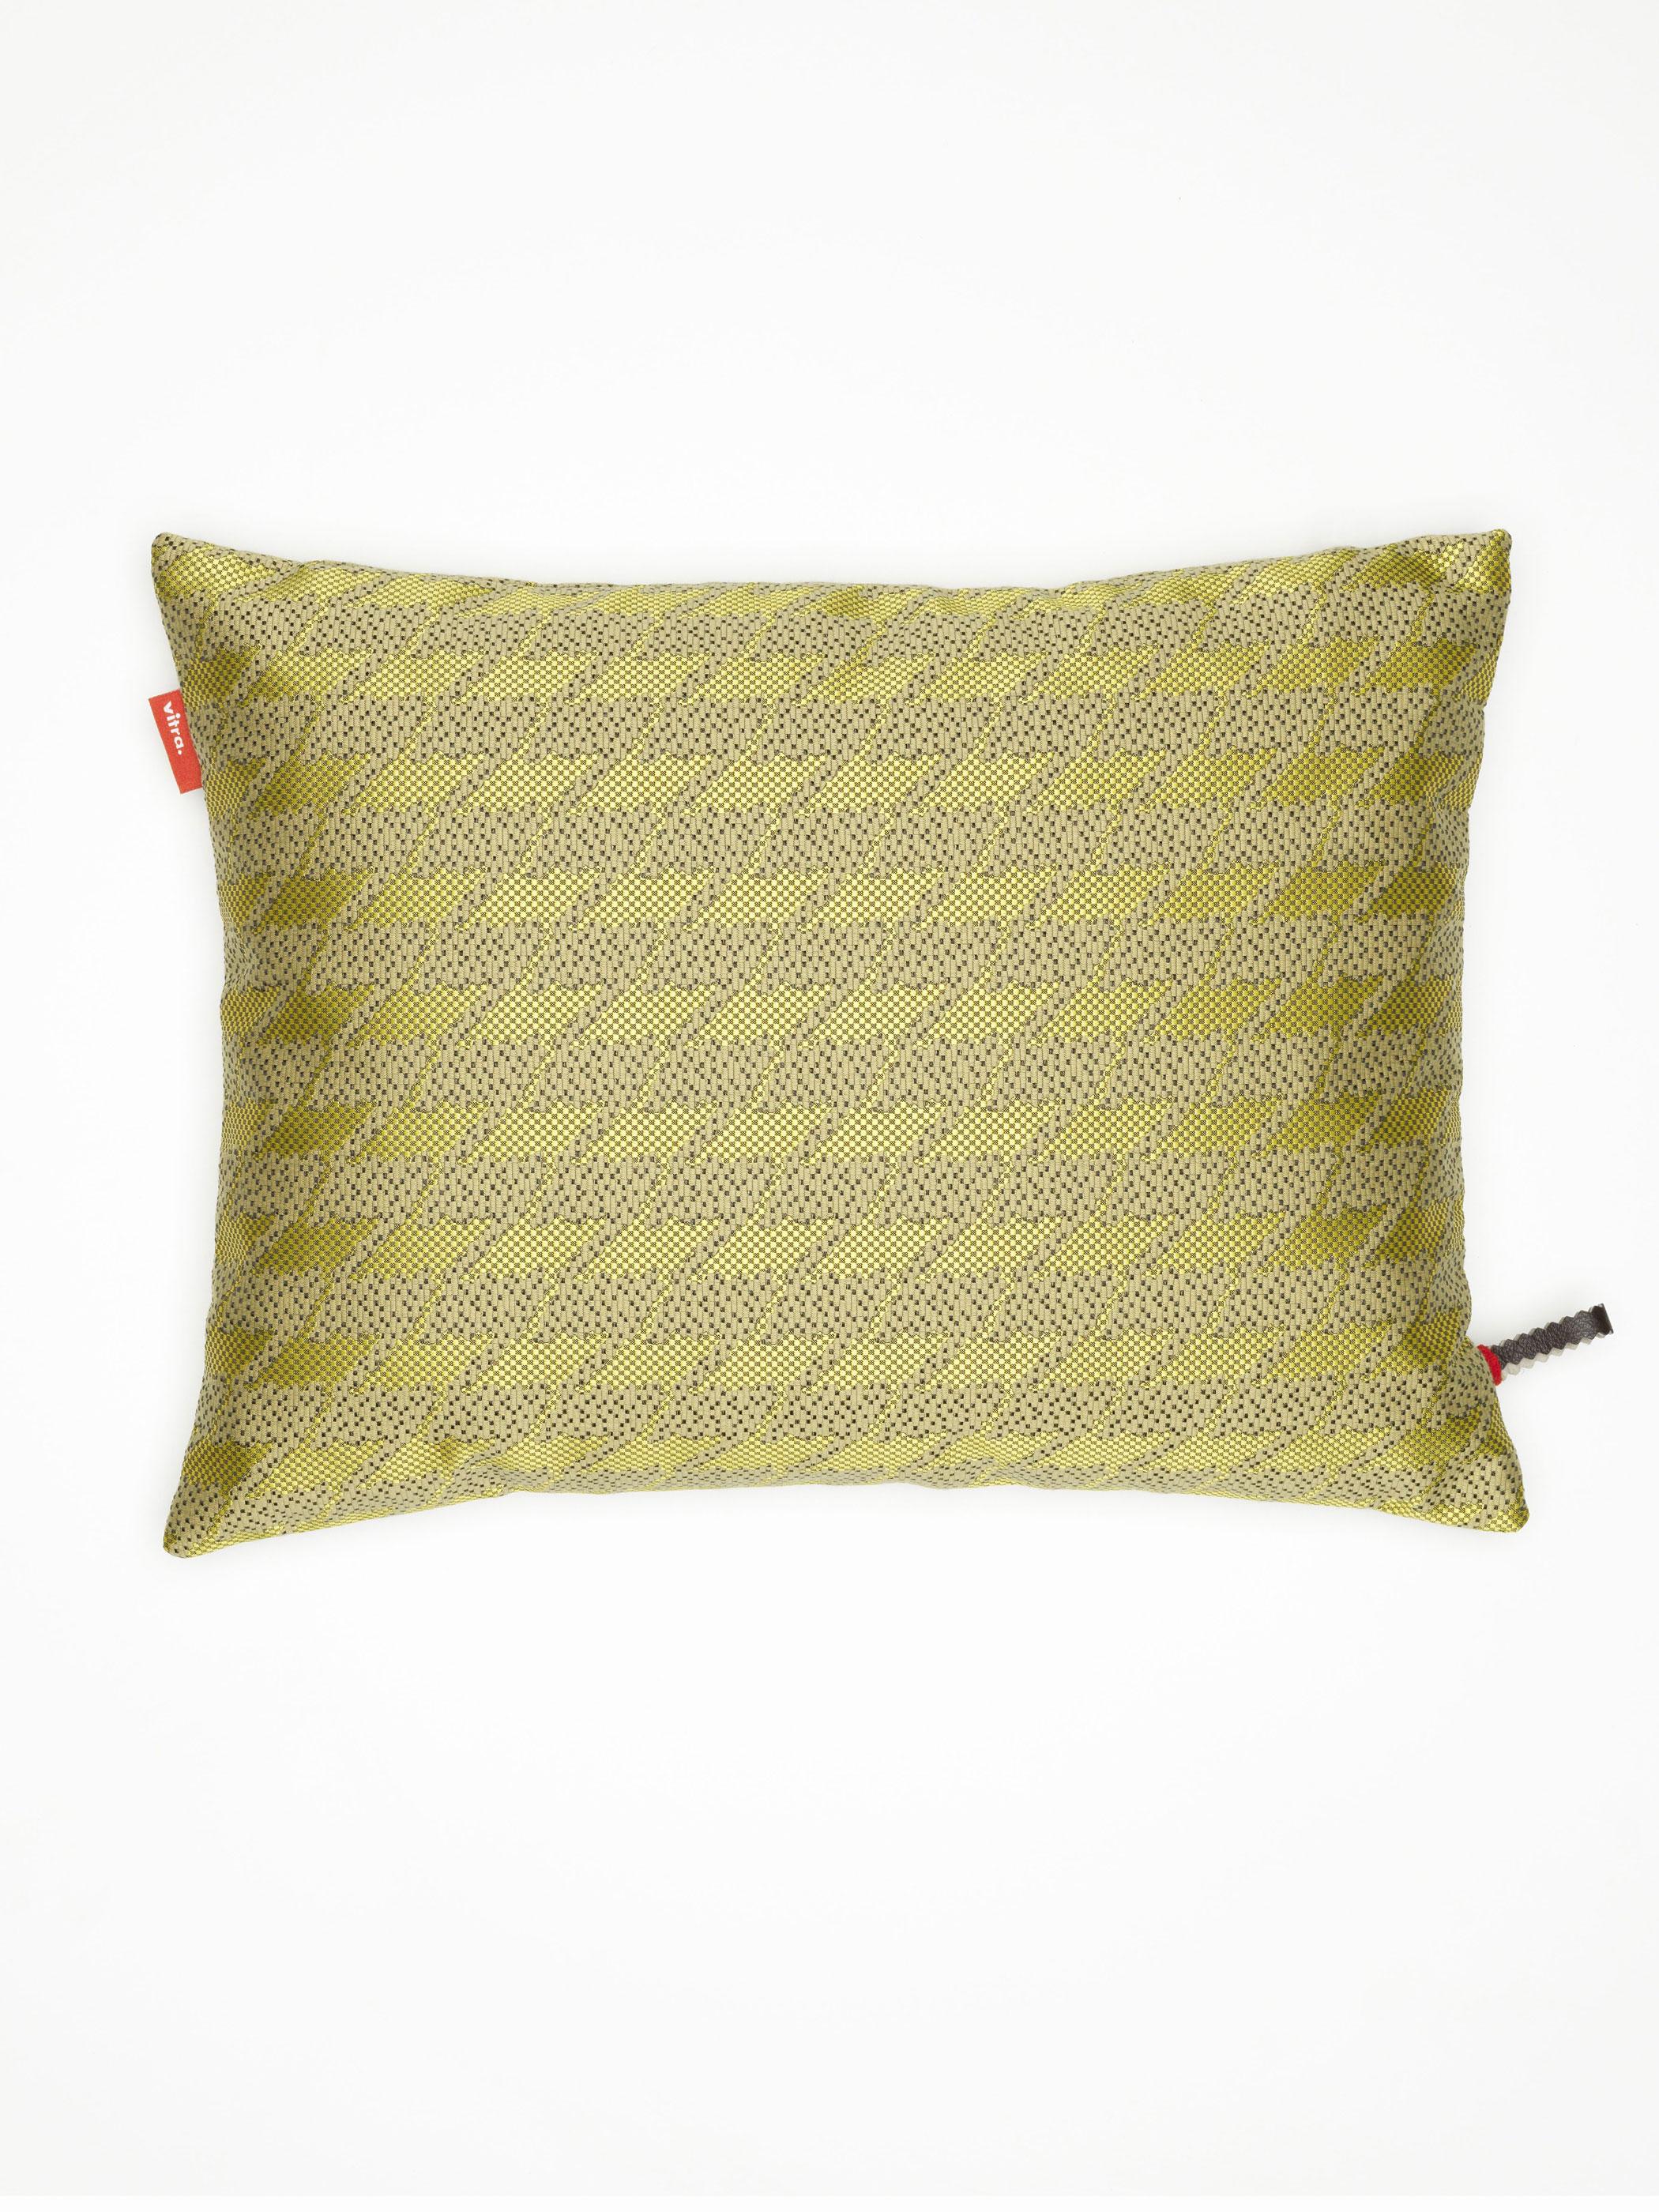 vitra kissen maharam repeat classic houndstooth lemon produktdetails. Black Bedroom Furniture Sets. Home Design Ideas